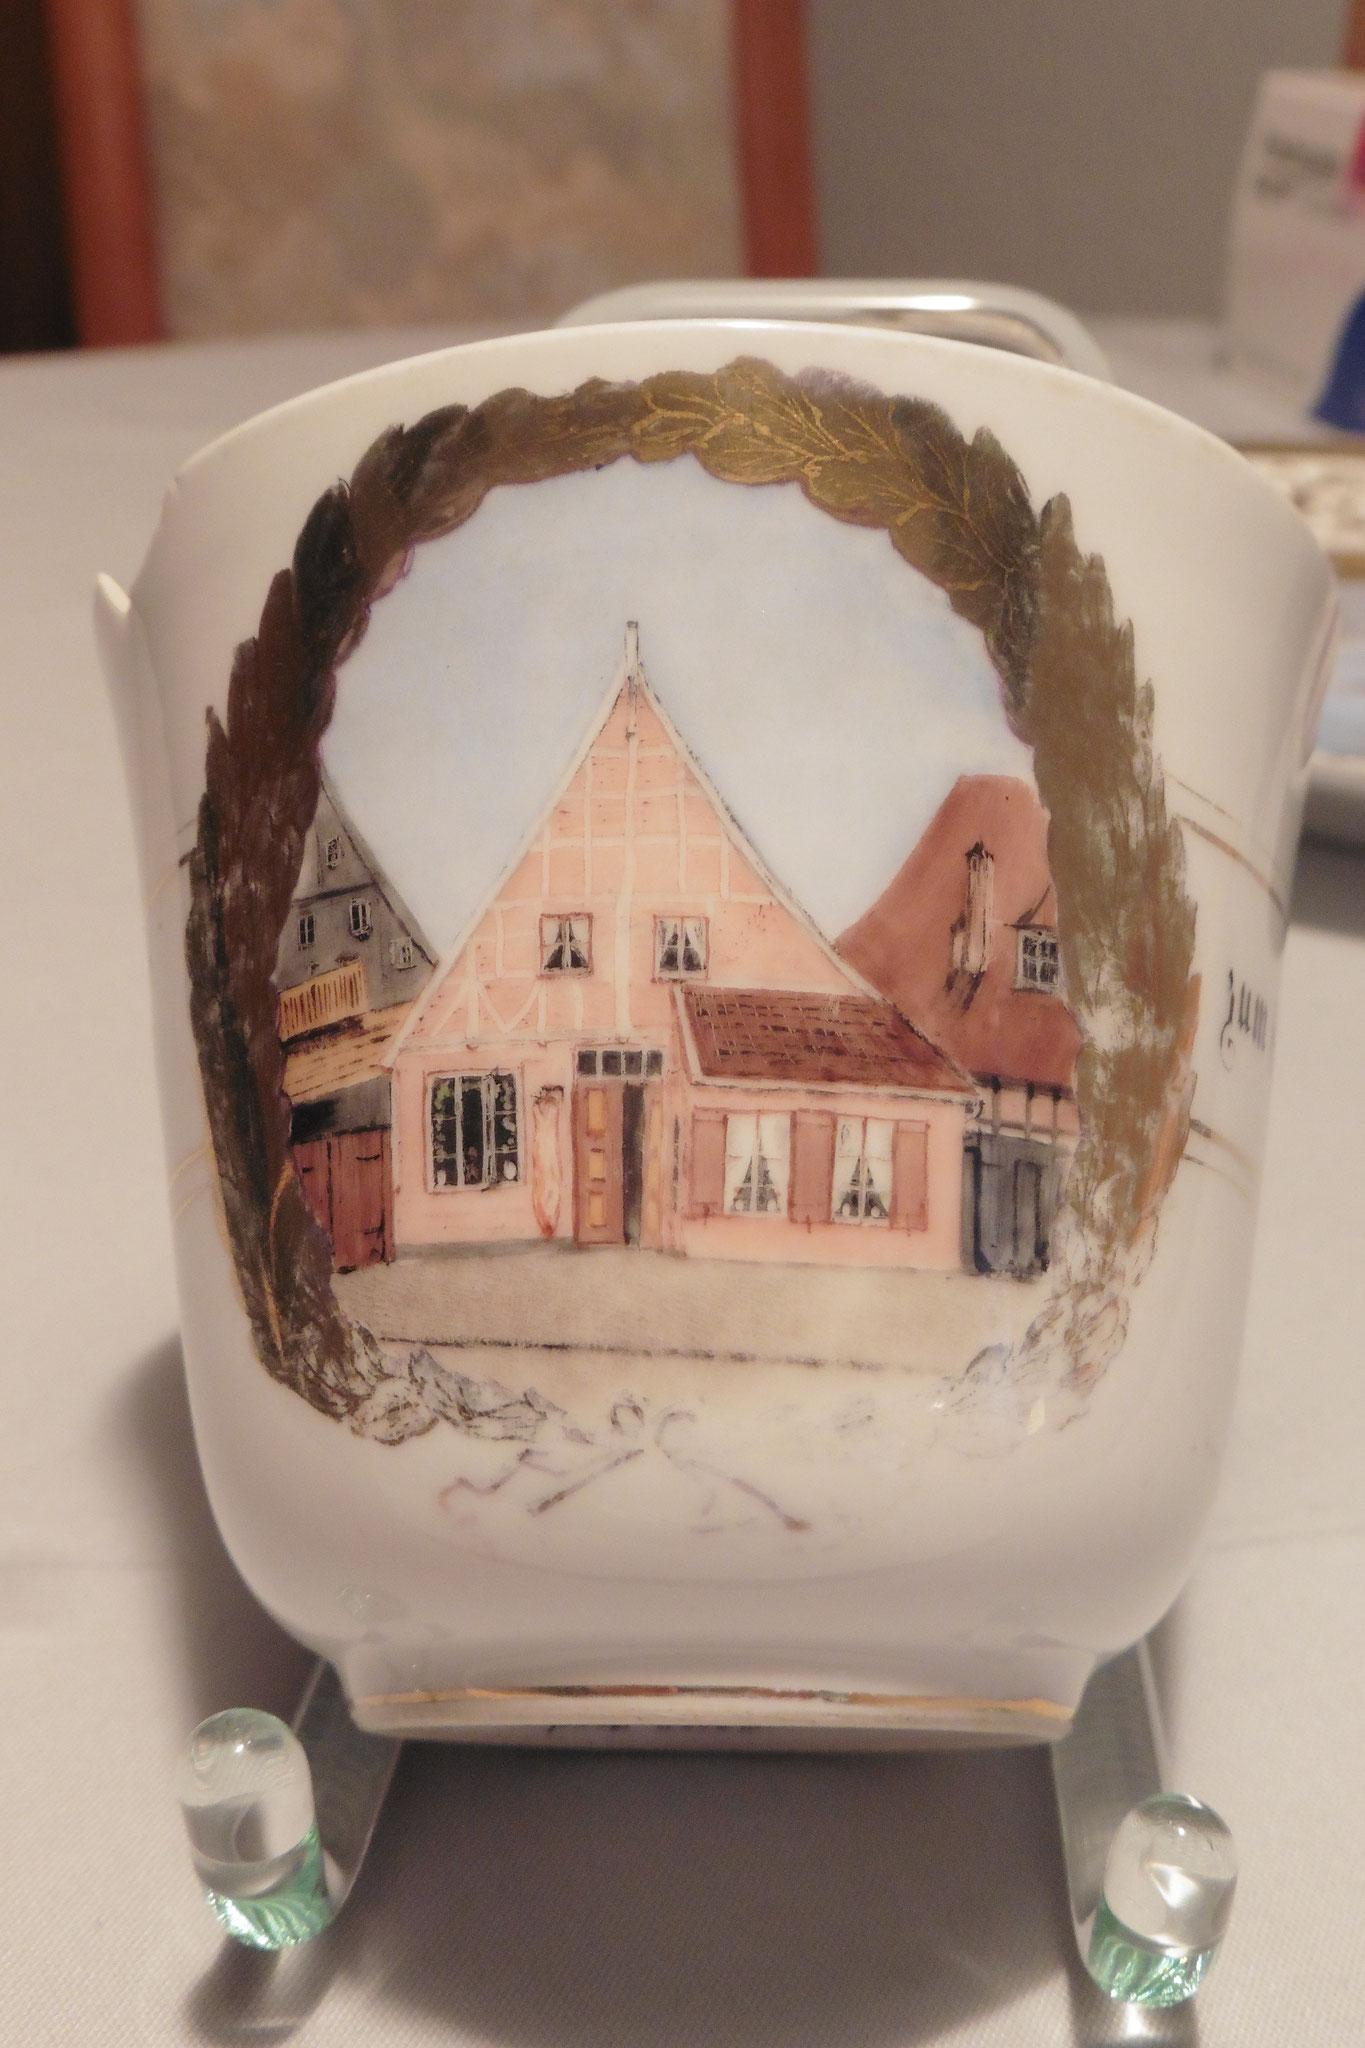 Bemalte Tasse von Porzellanmaler Christian Sass